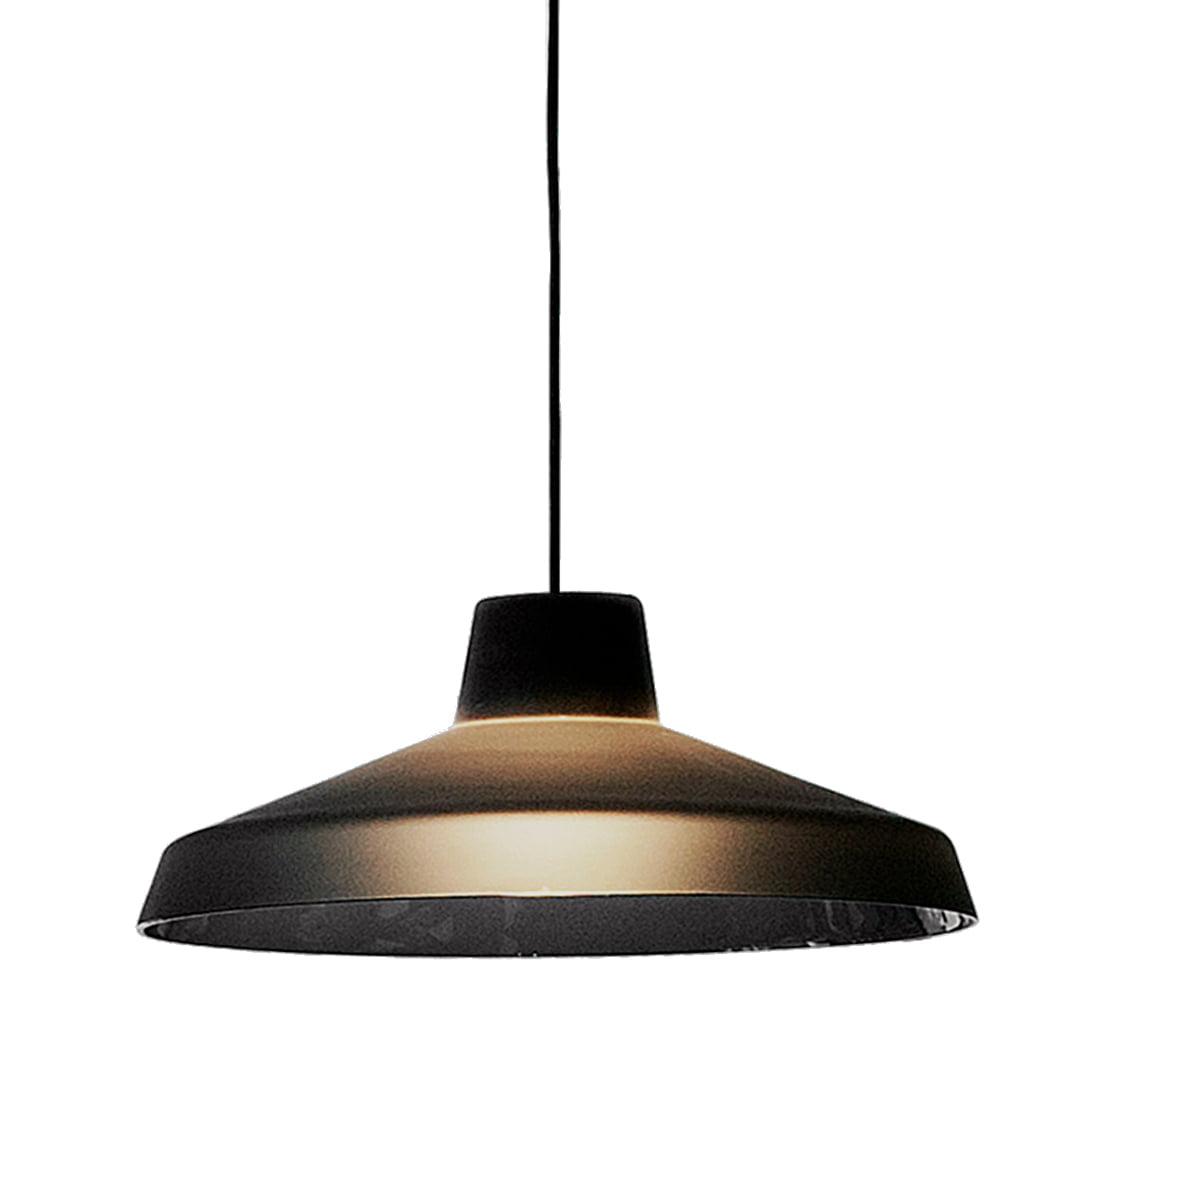 northern lighting evergreen pendant lamp. Black Bedroom Furniture Sets. Home Design Ideas